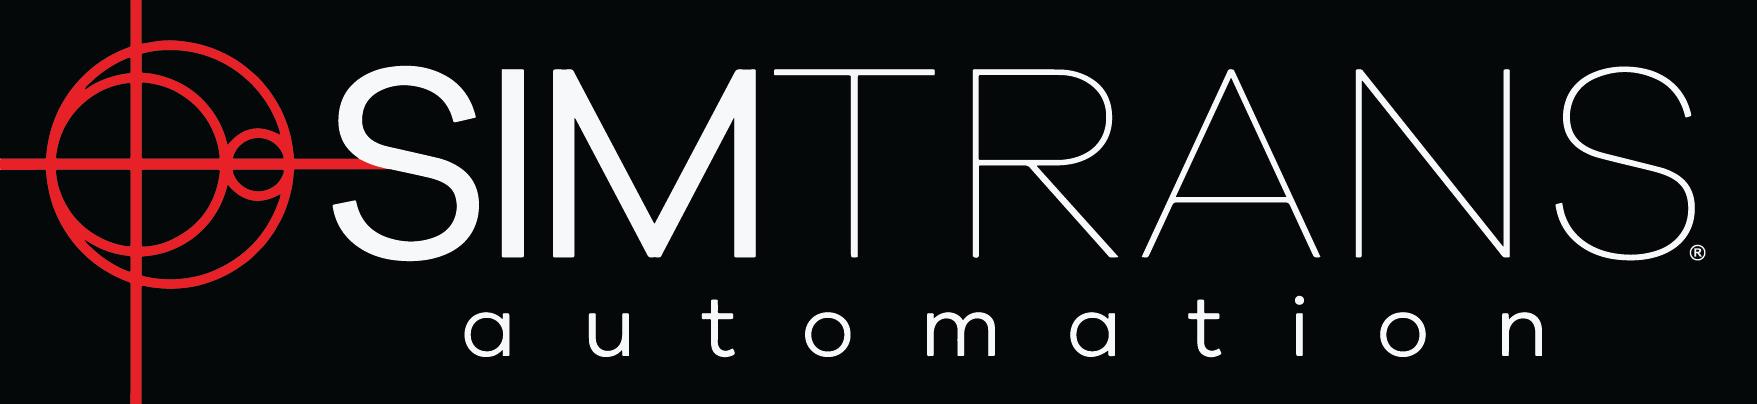 SimTrans-01